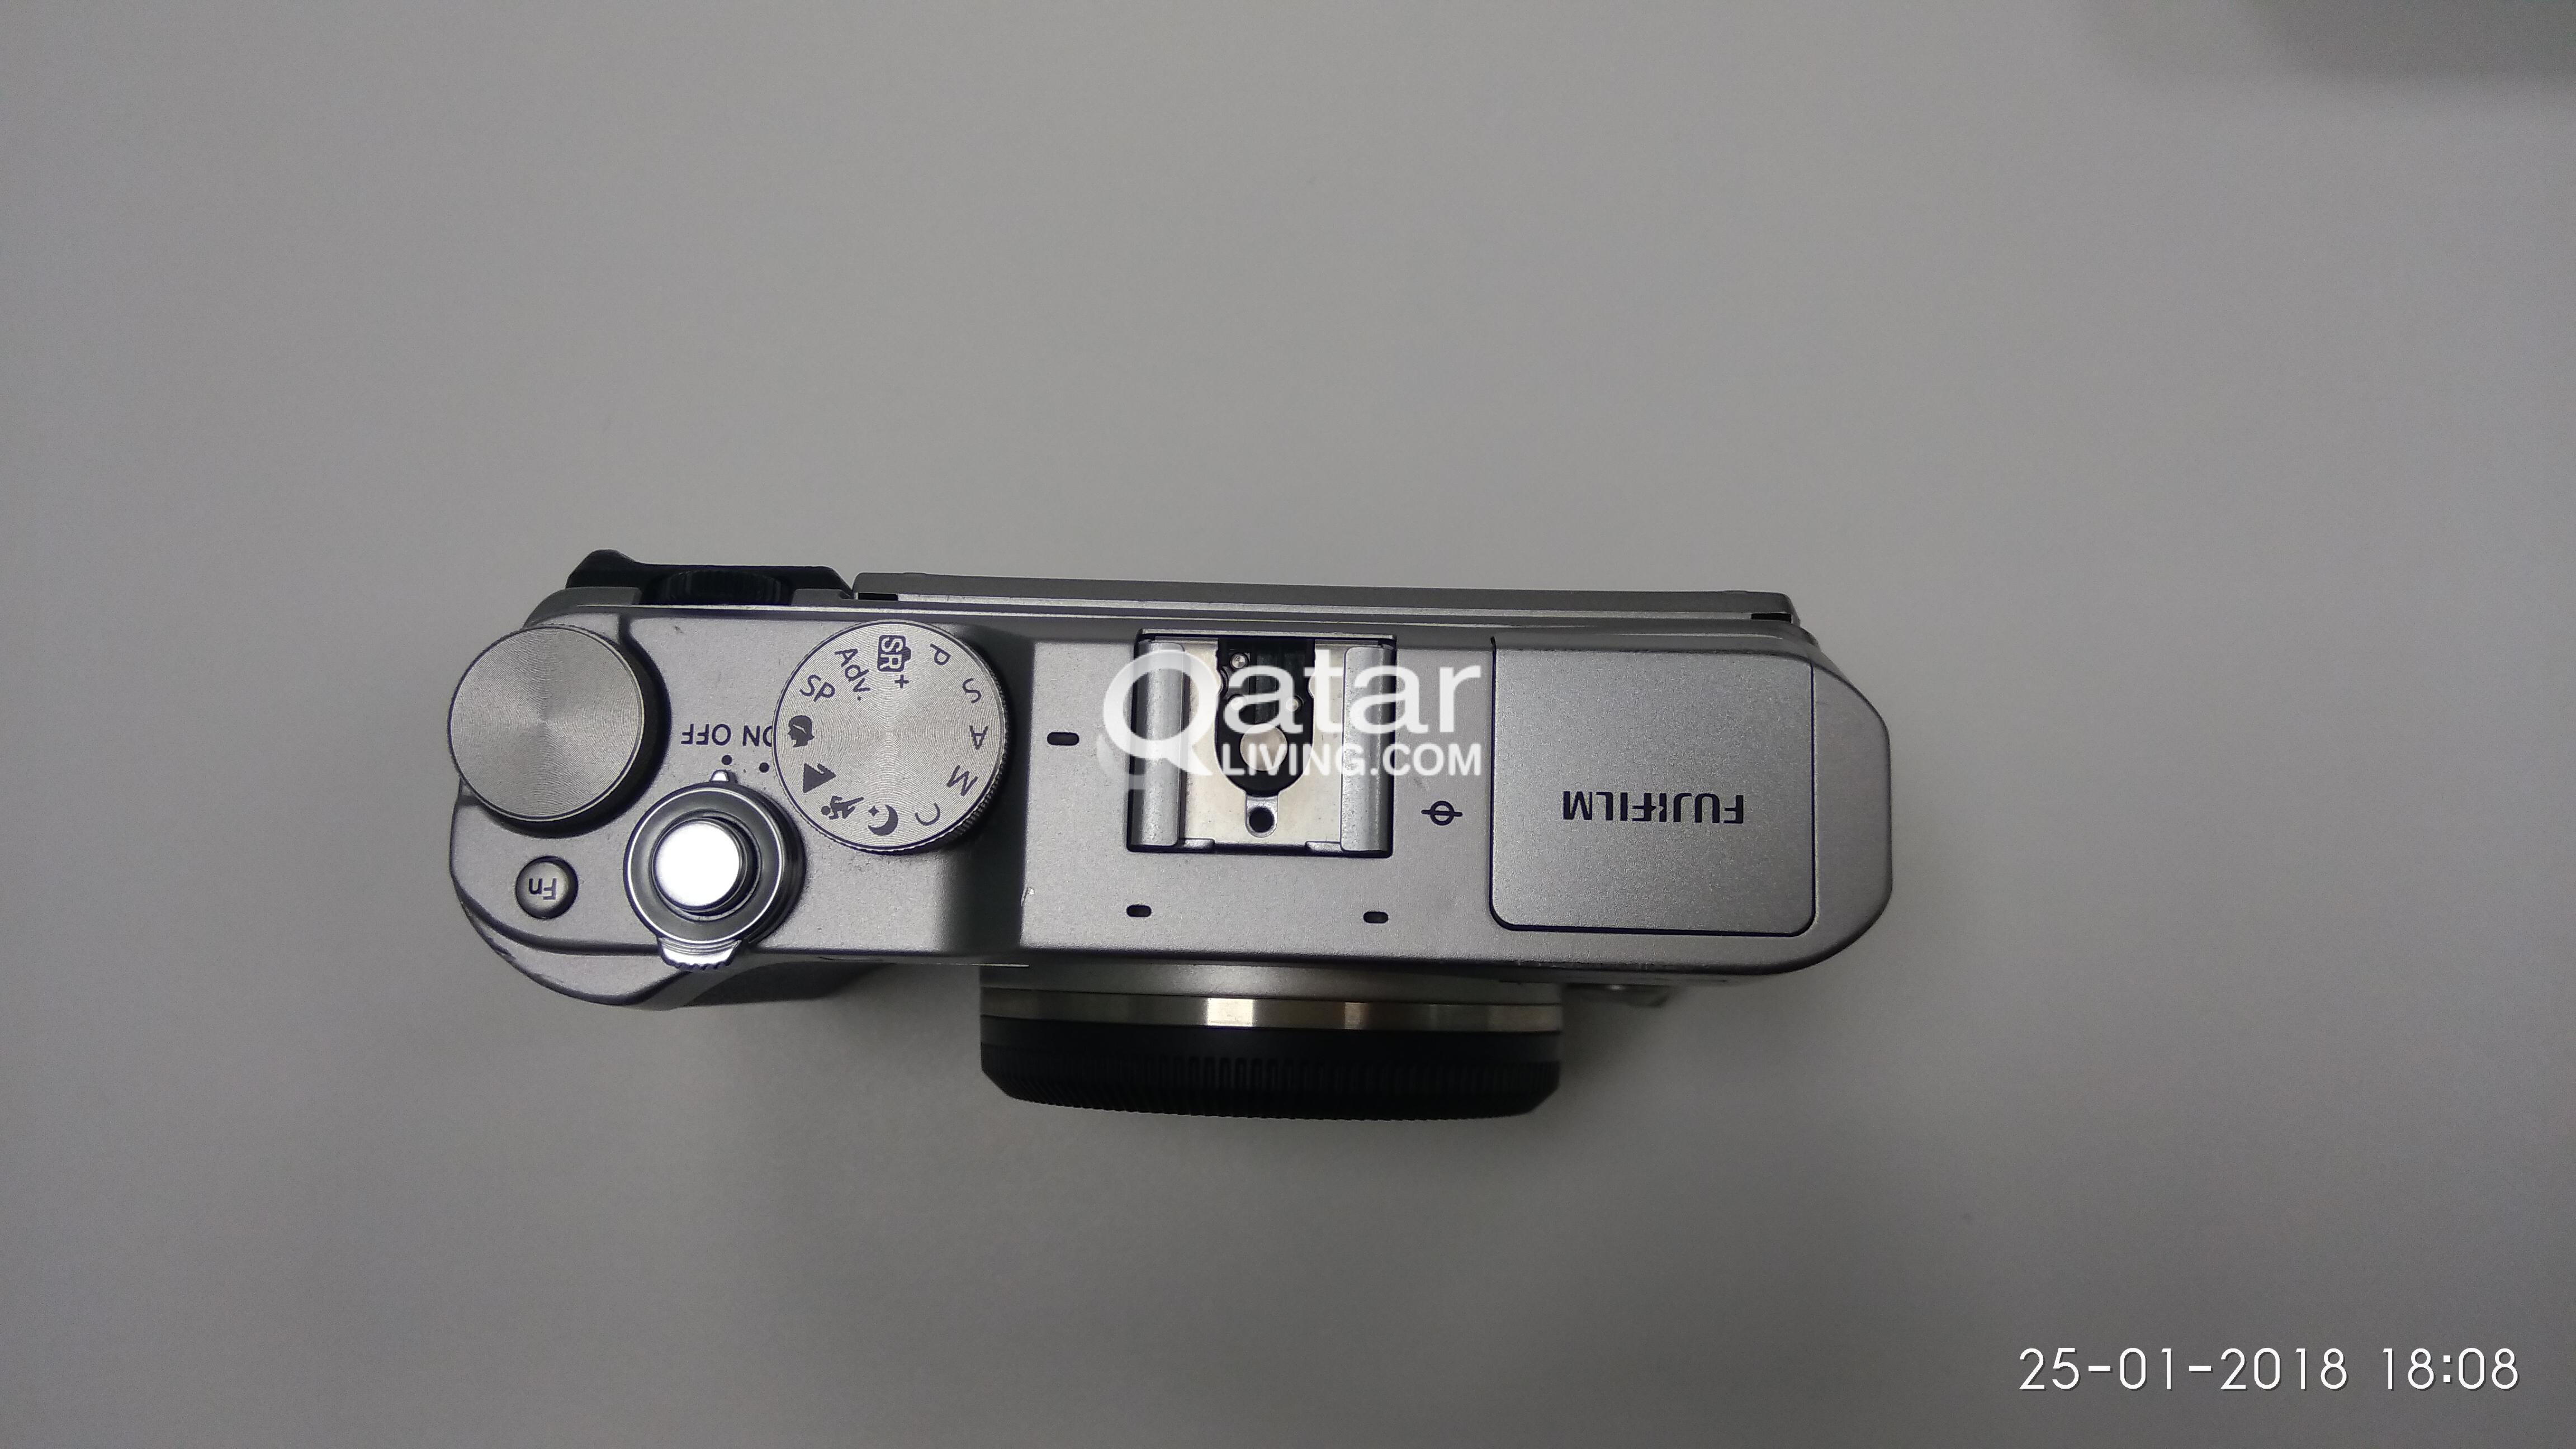 Fuji Fujifilm X A3 Mirrorless Dslr Camera With Kit Lens 16 50mm Silver Qatar Living